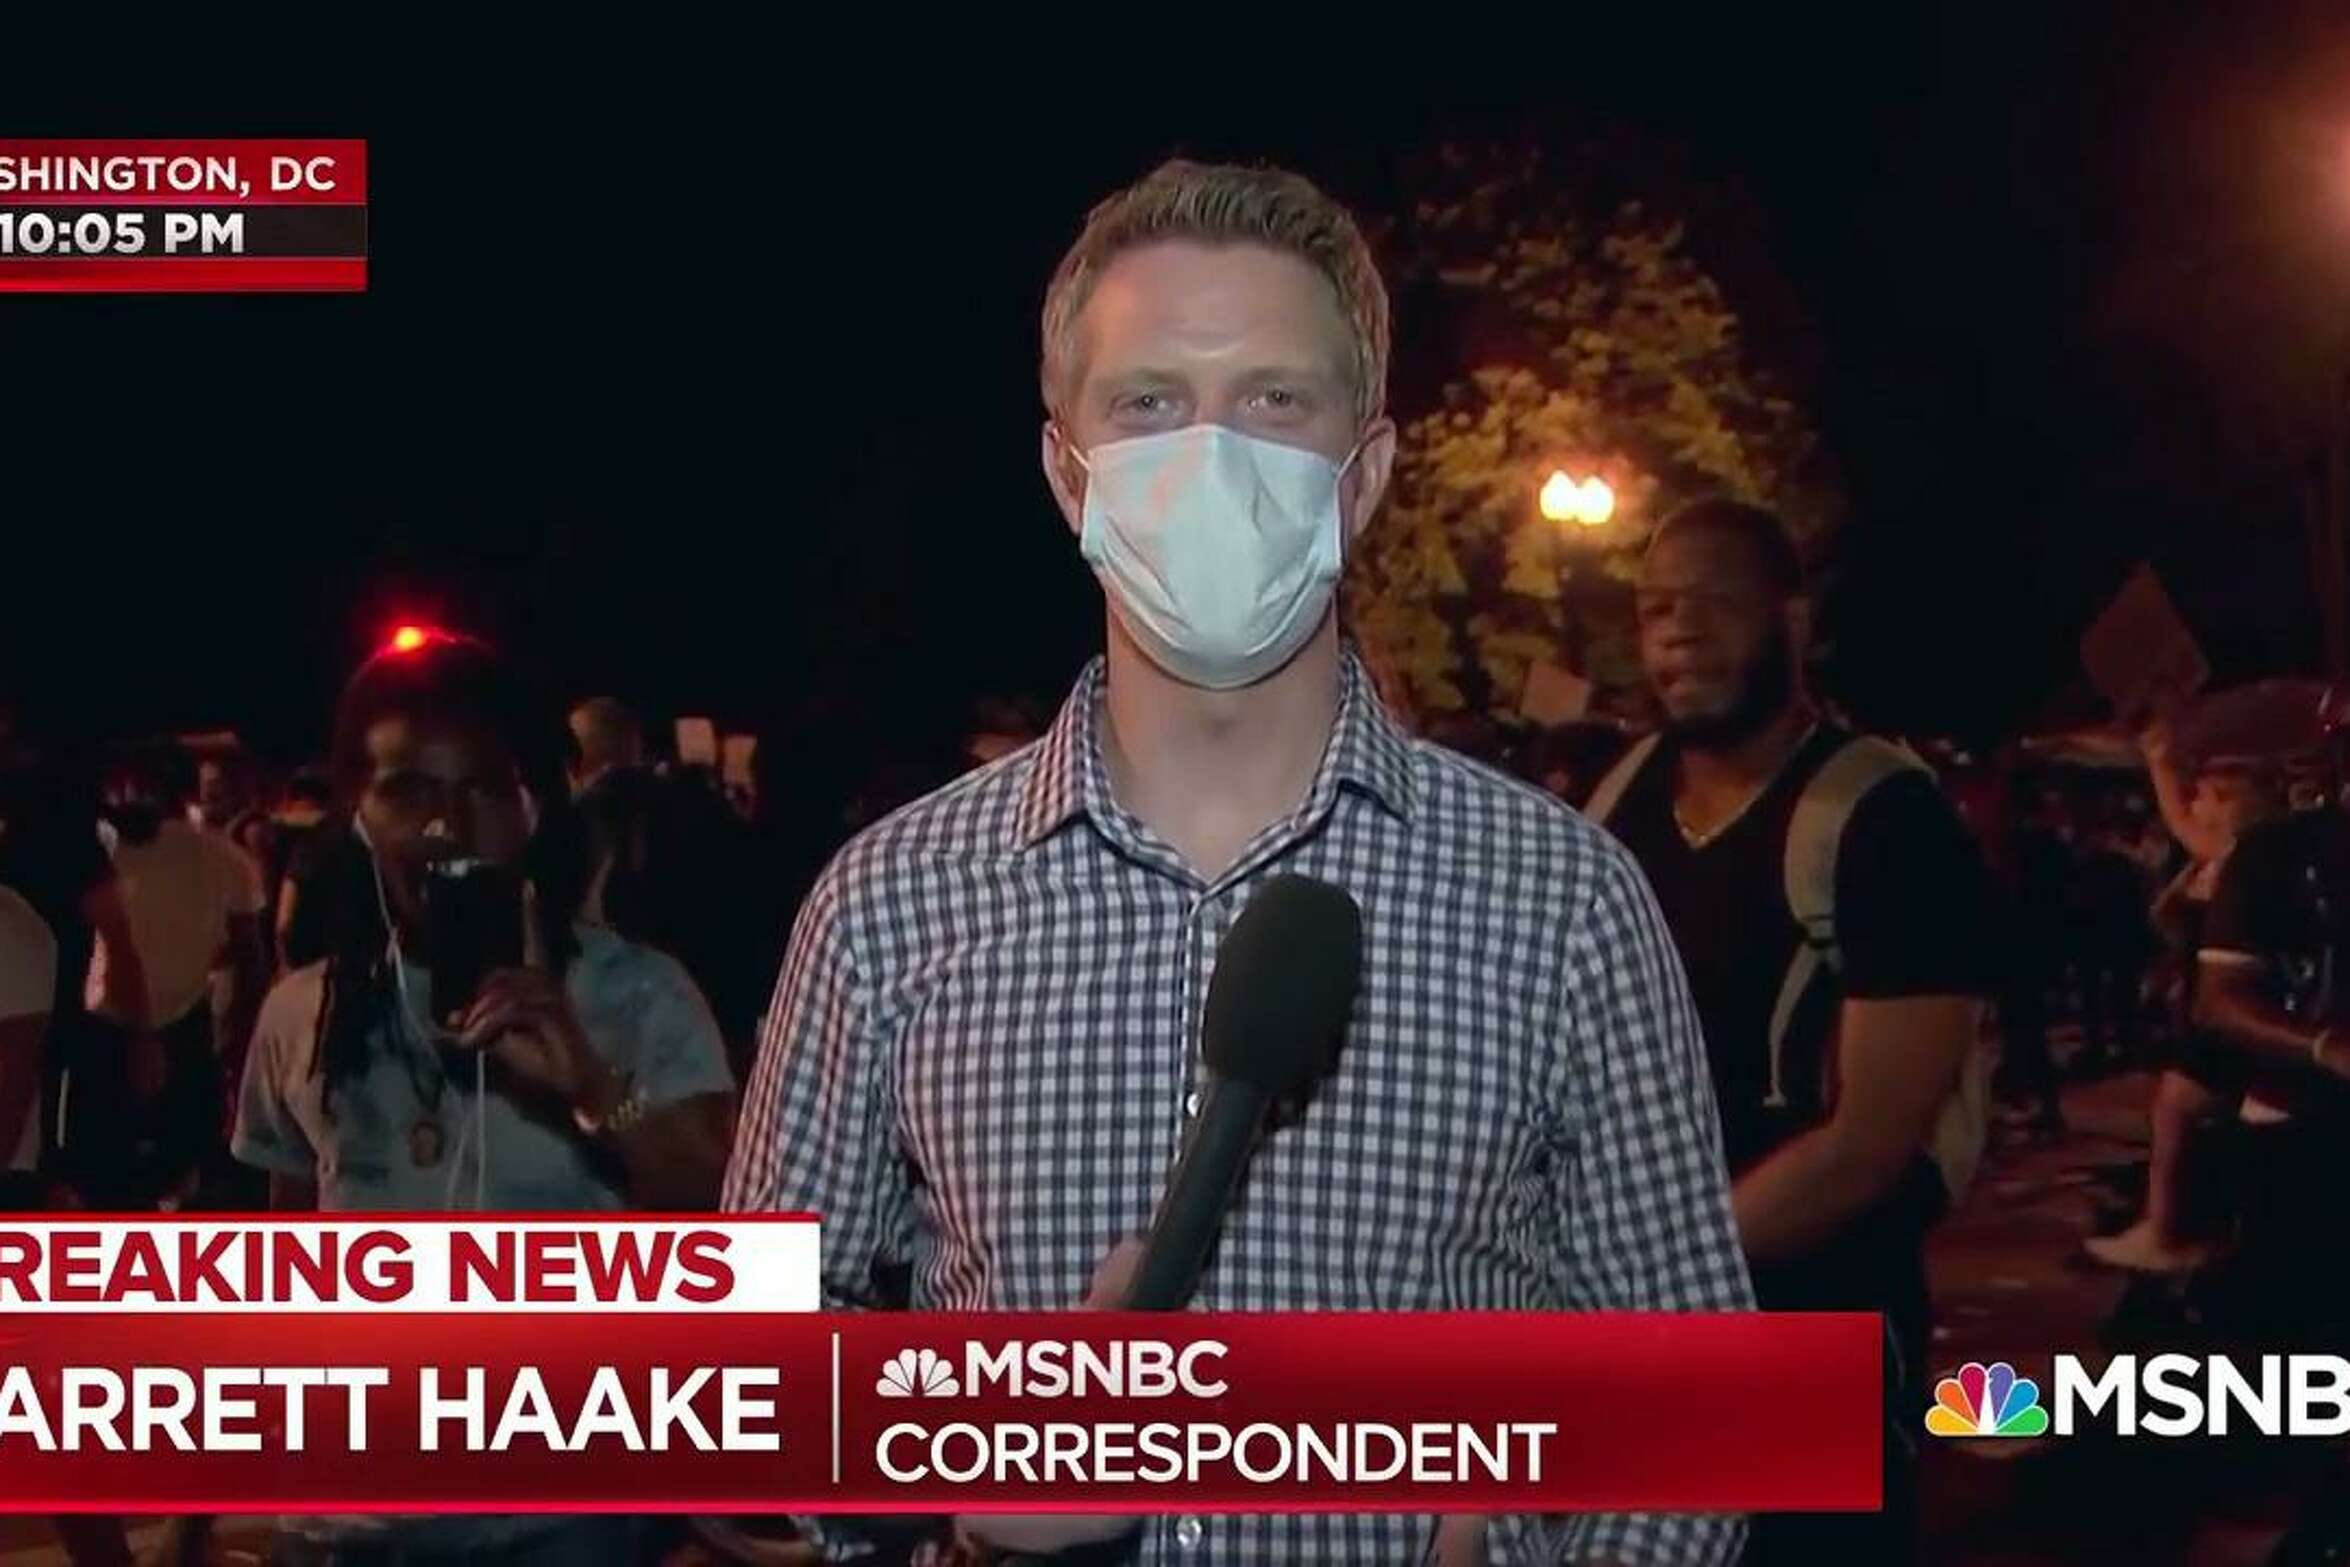 NBC/MSNBC reporter Garrett Haake in Washington D.C. during Black Lives Matter protests